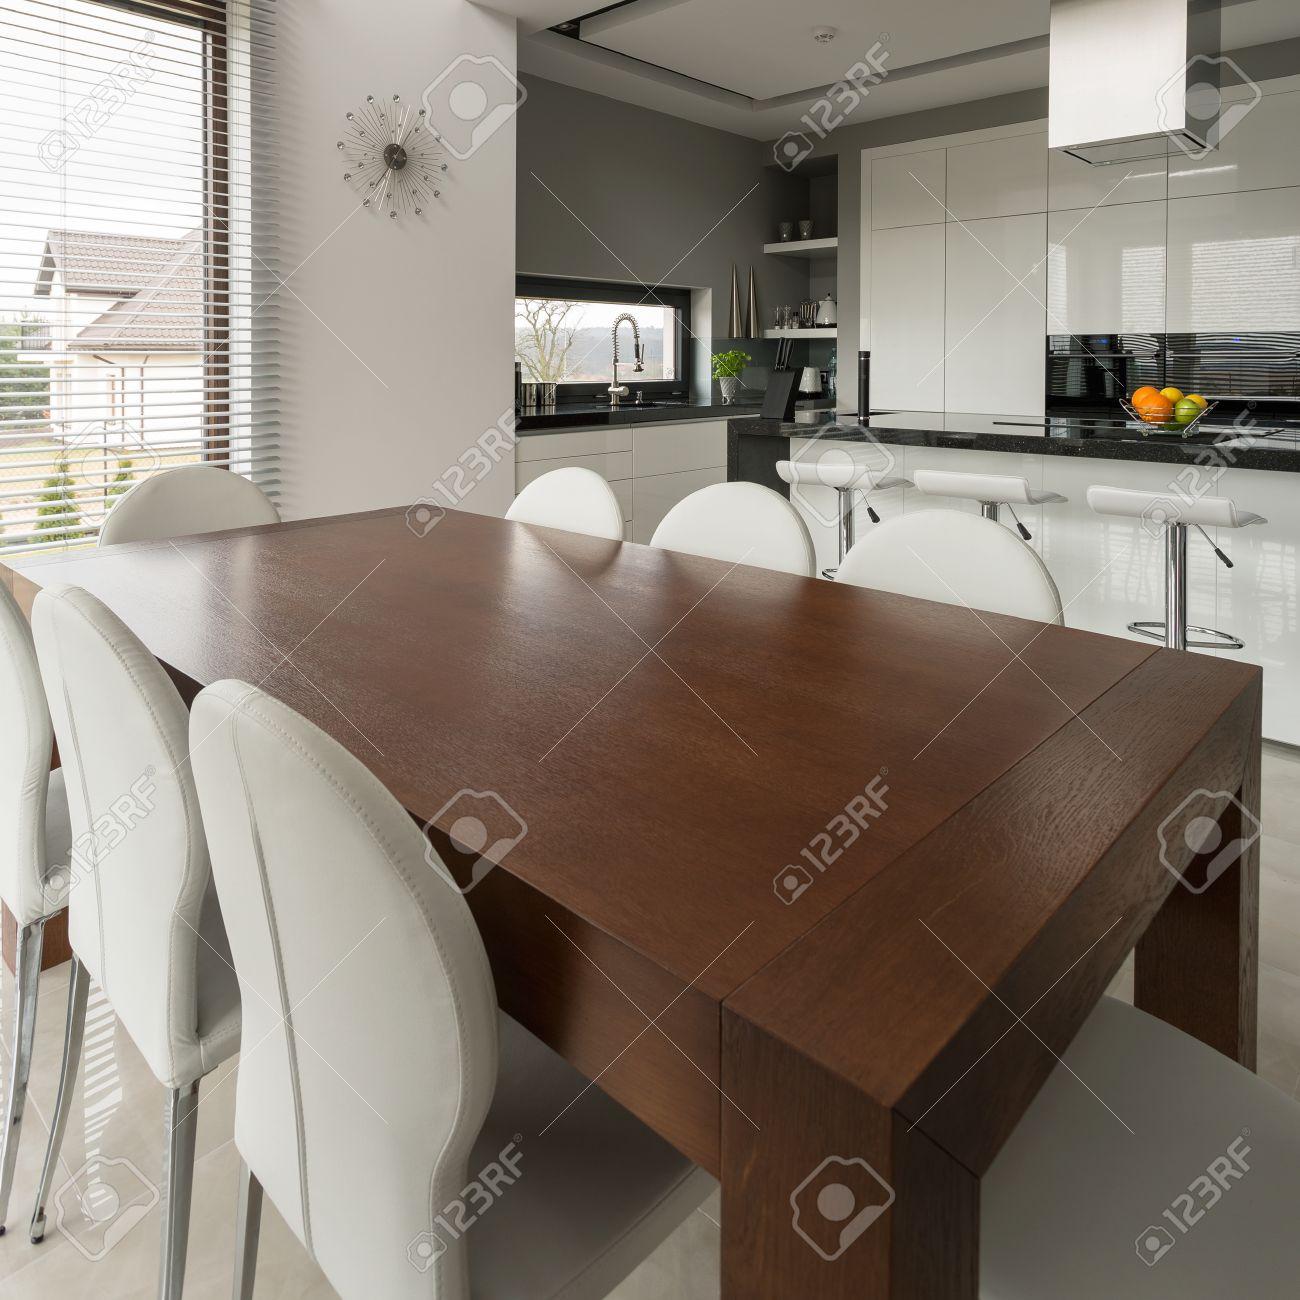 Grande Table A Manger En Bois Dans La Cuisine Moderne Cher